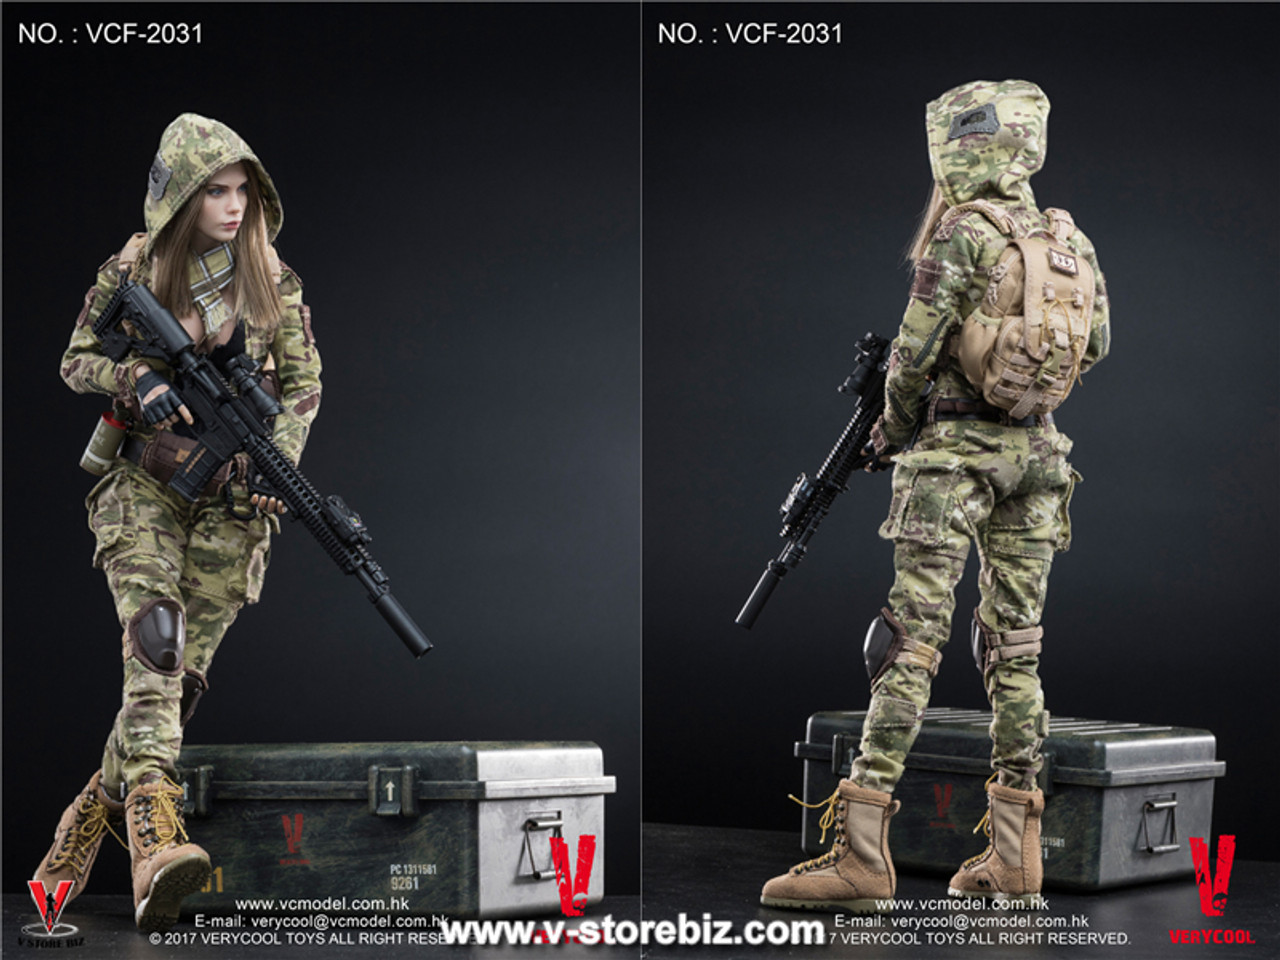 1//6 Verycool Villa Python Female Action Figure M4 corps VCF 2035B